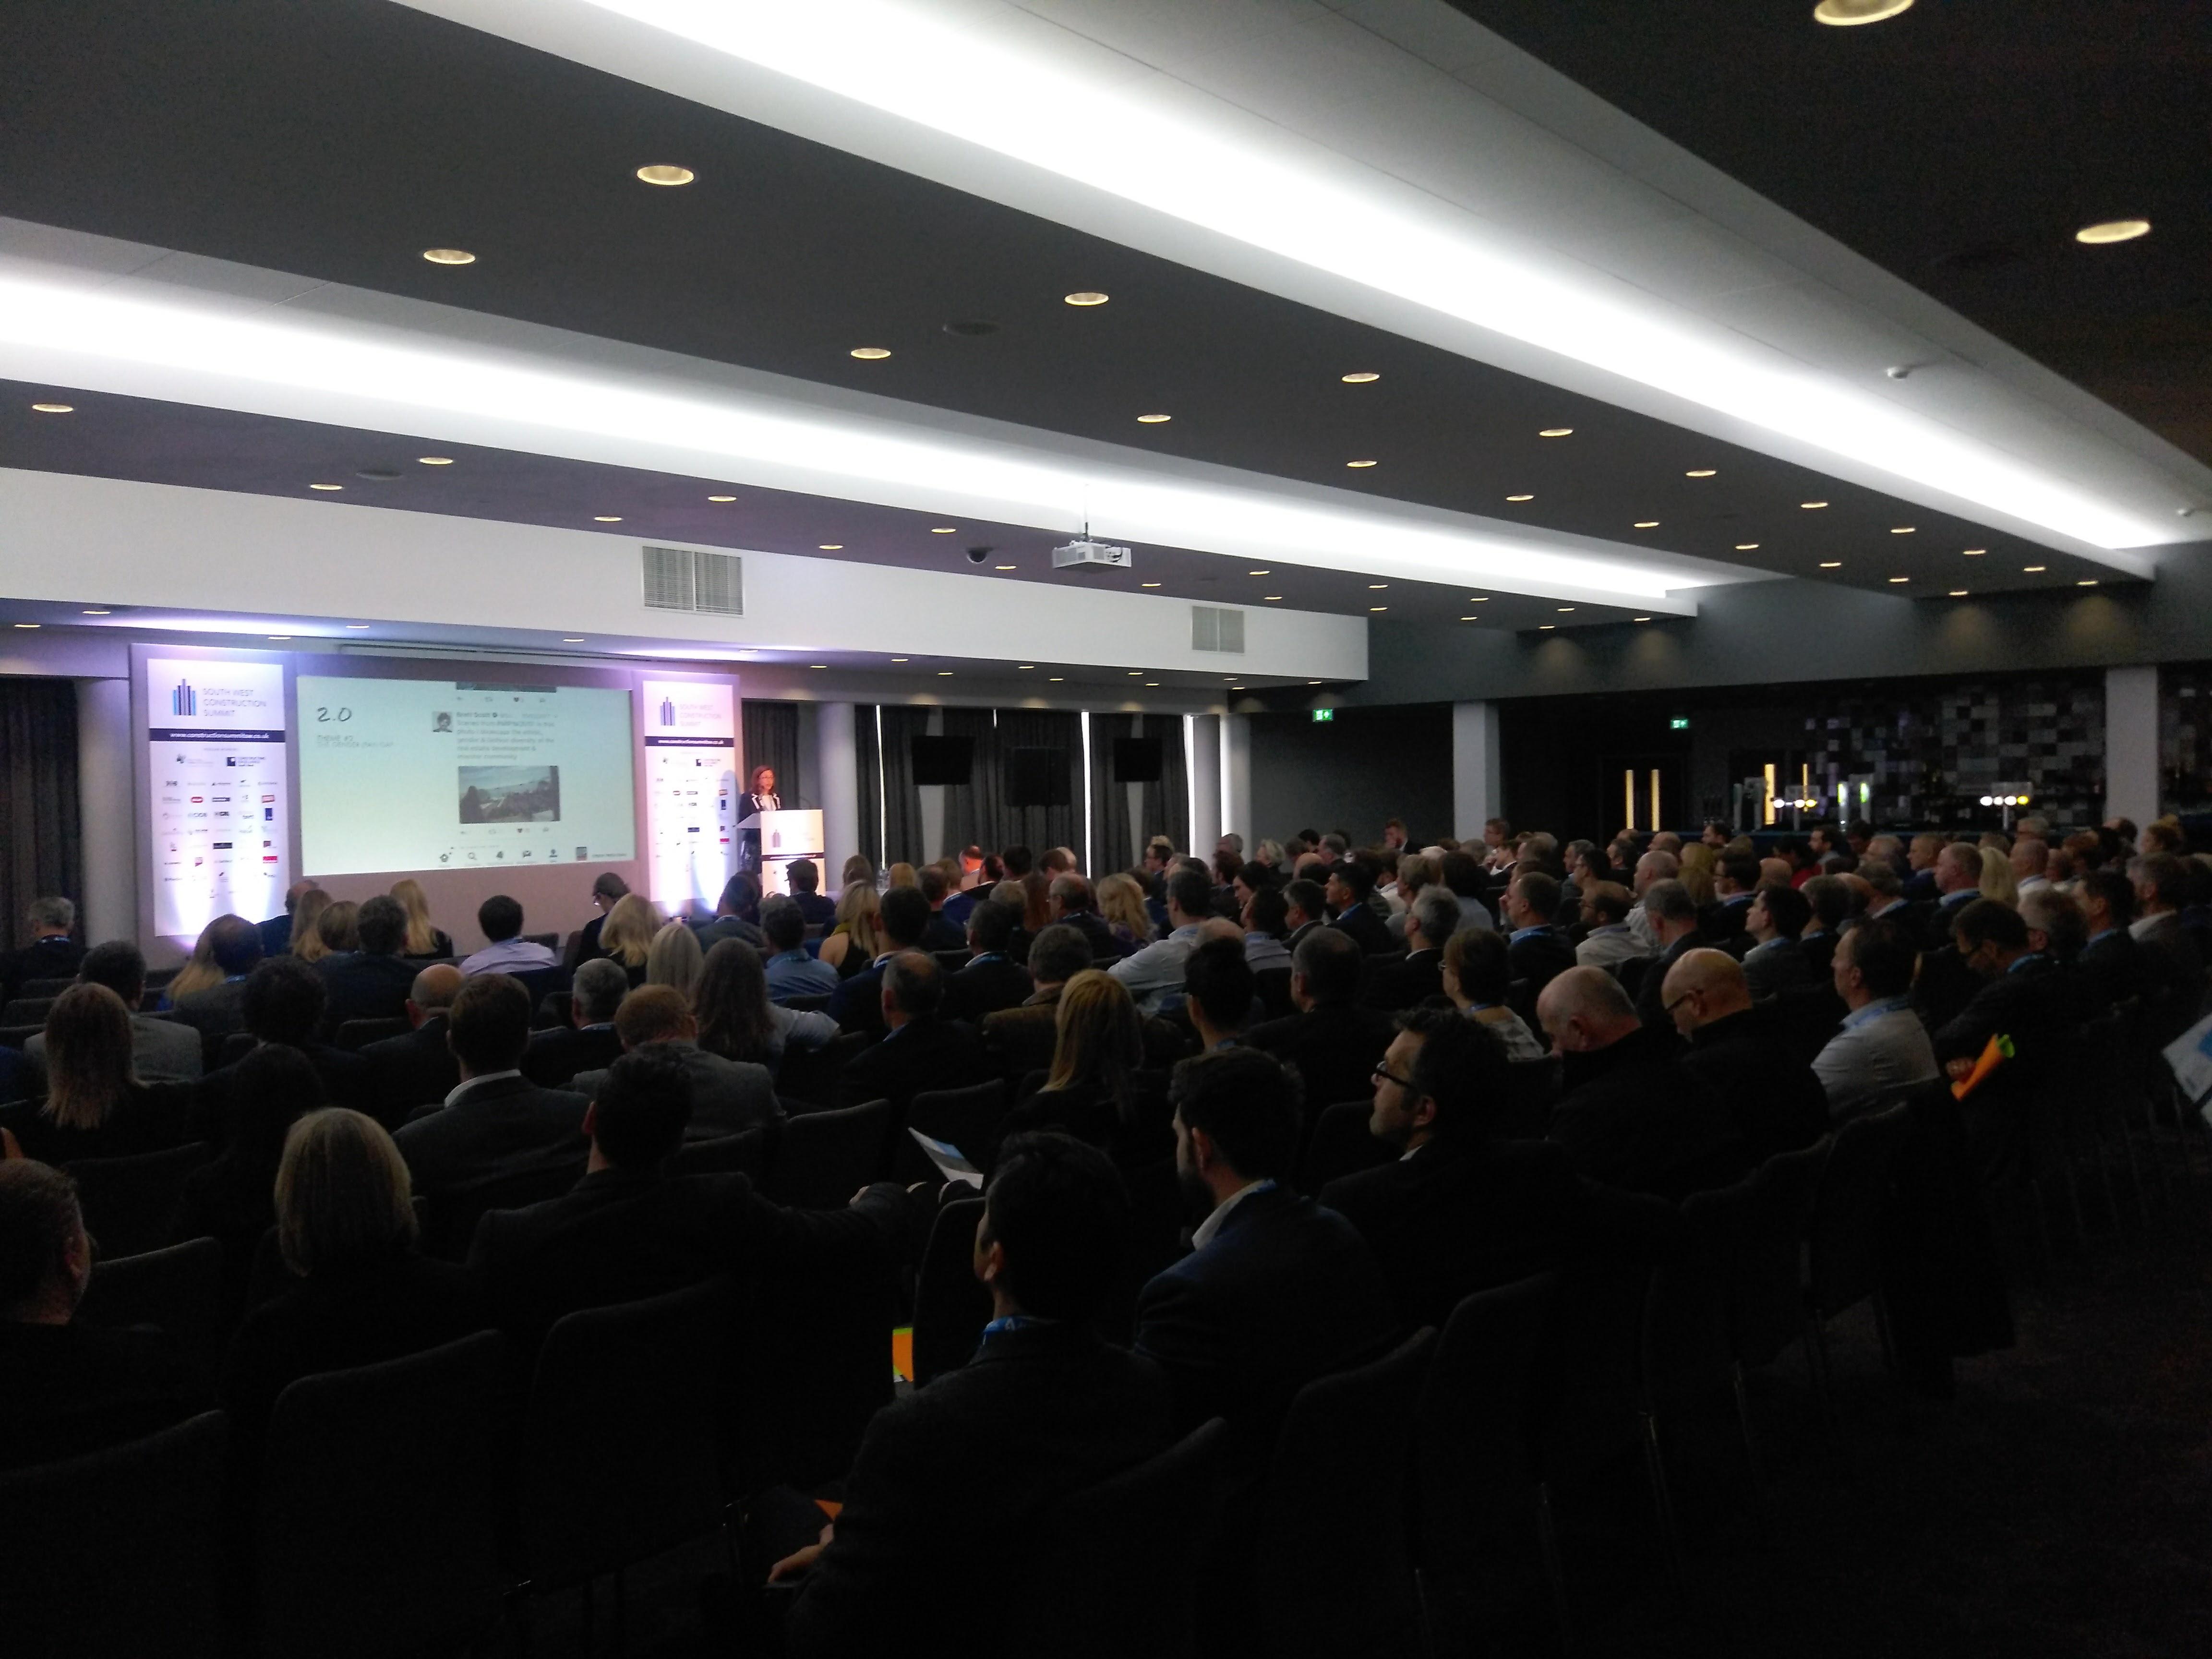 Ashton Gate Conference